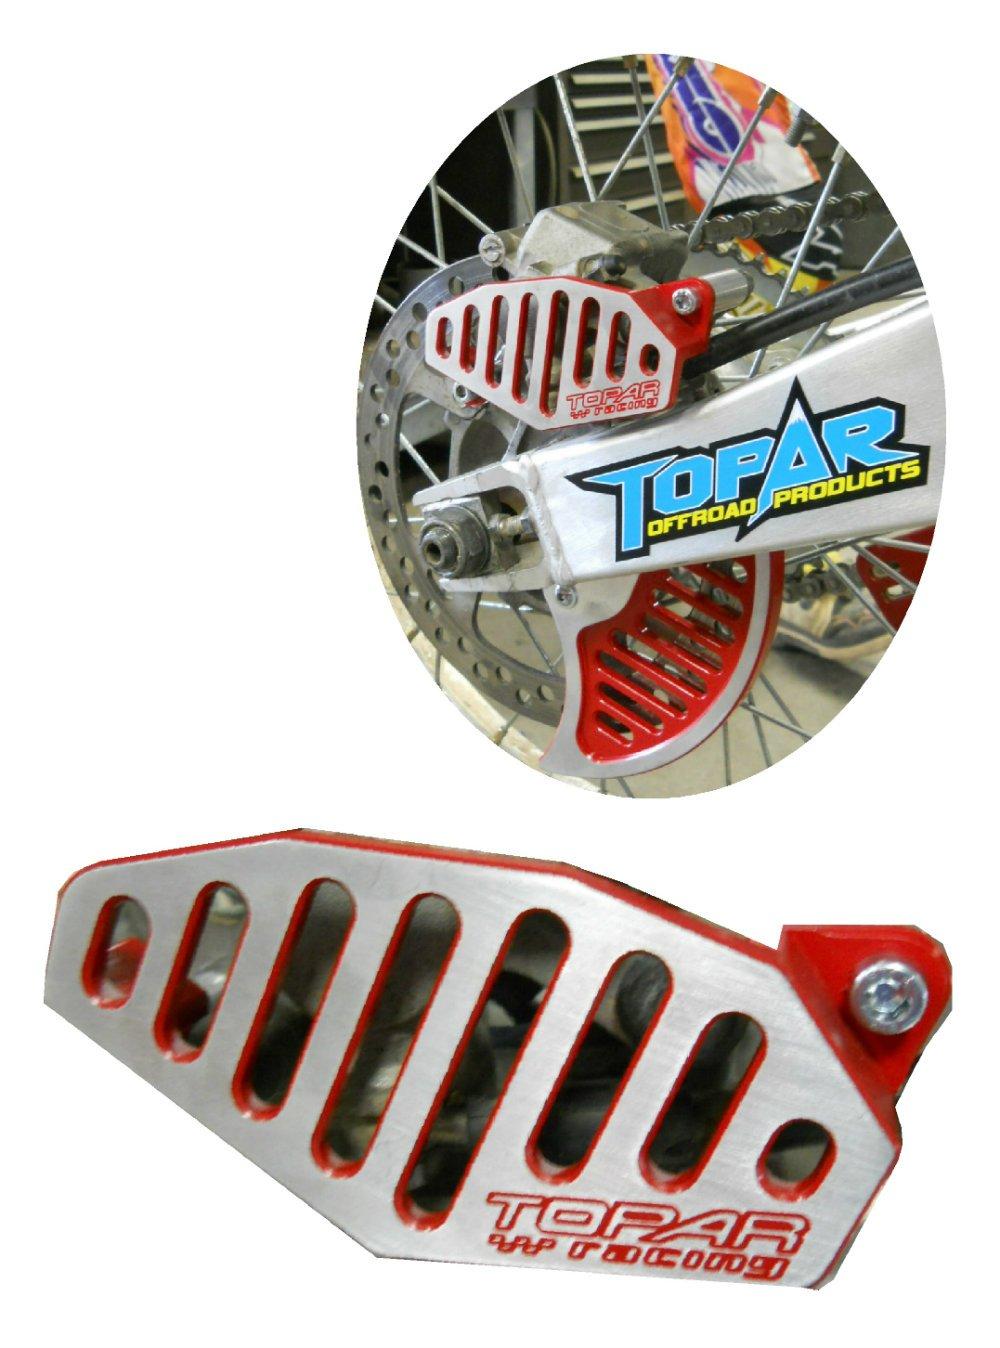 Topar Racing 130-108-XR-HCR OEM REPLACEMENT HONDA REAR BRAKE CALIPER GUARD 1999-2001 CR125,CR250 and 2000-2006 XR650R